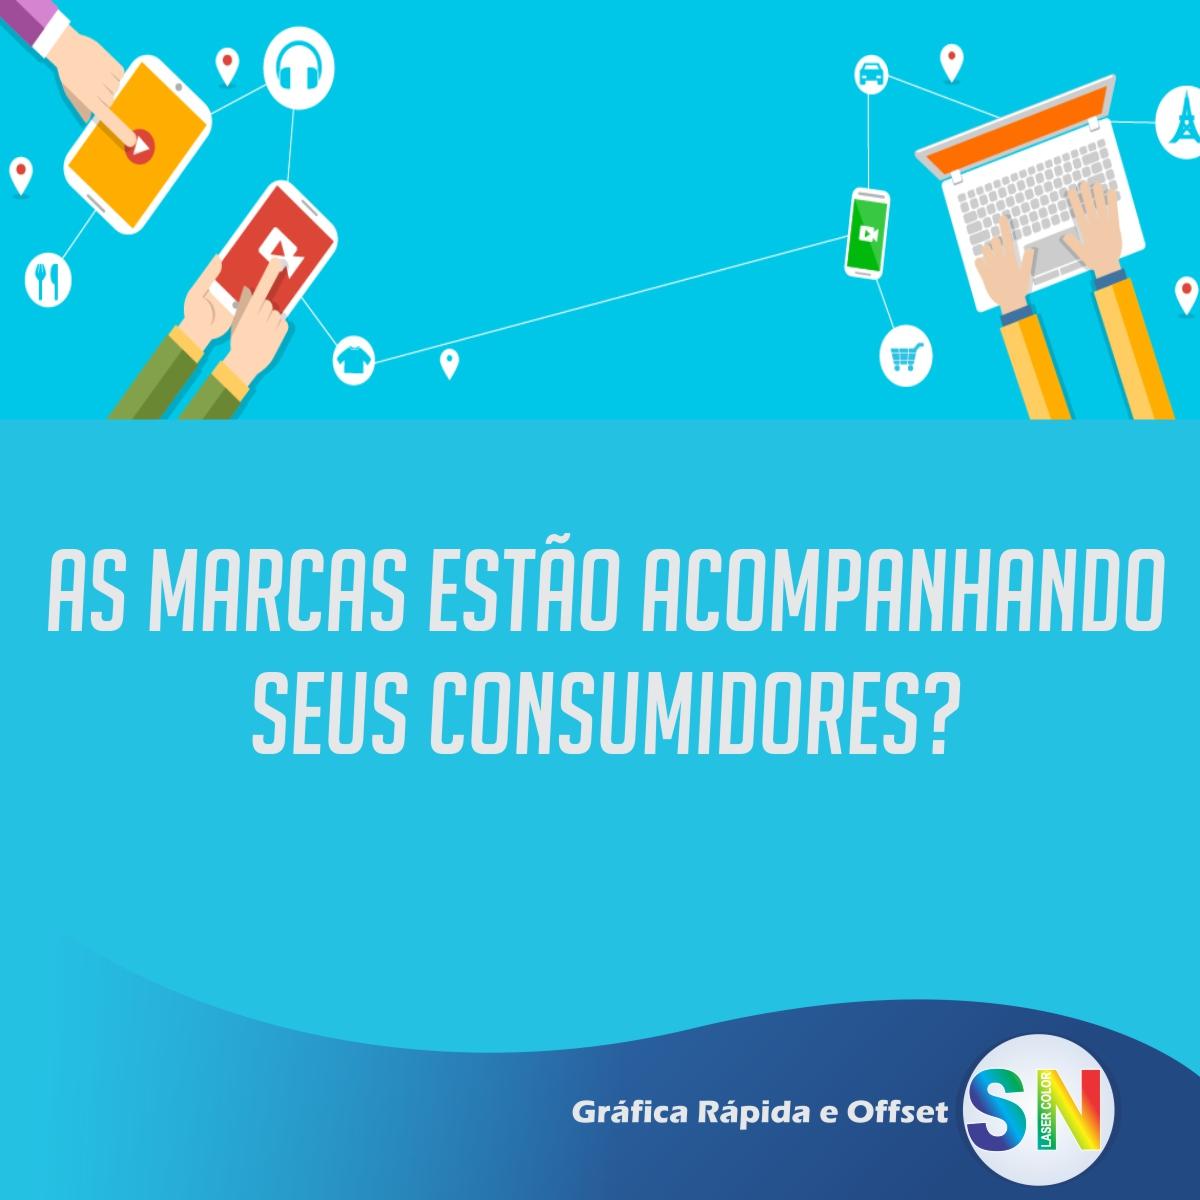 As marcas estao acompanhando os seus consumidores